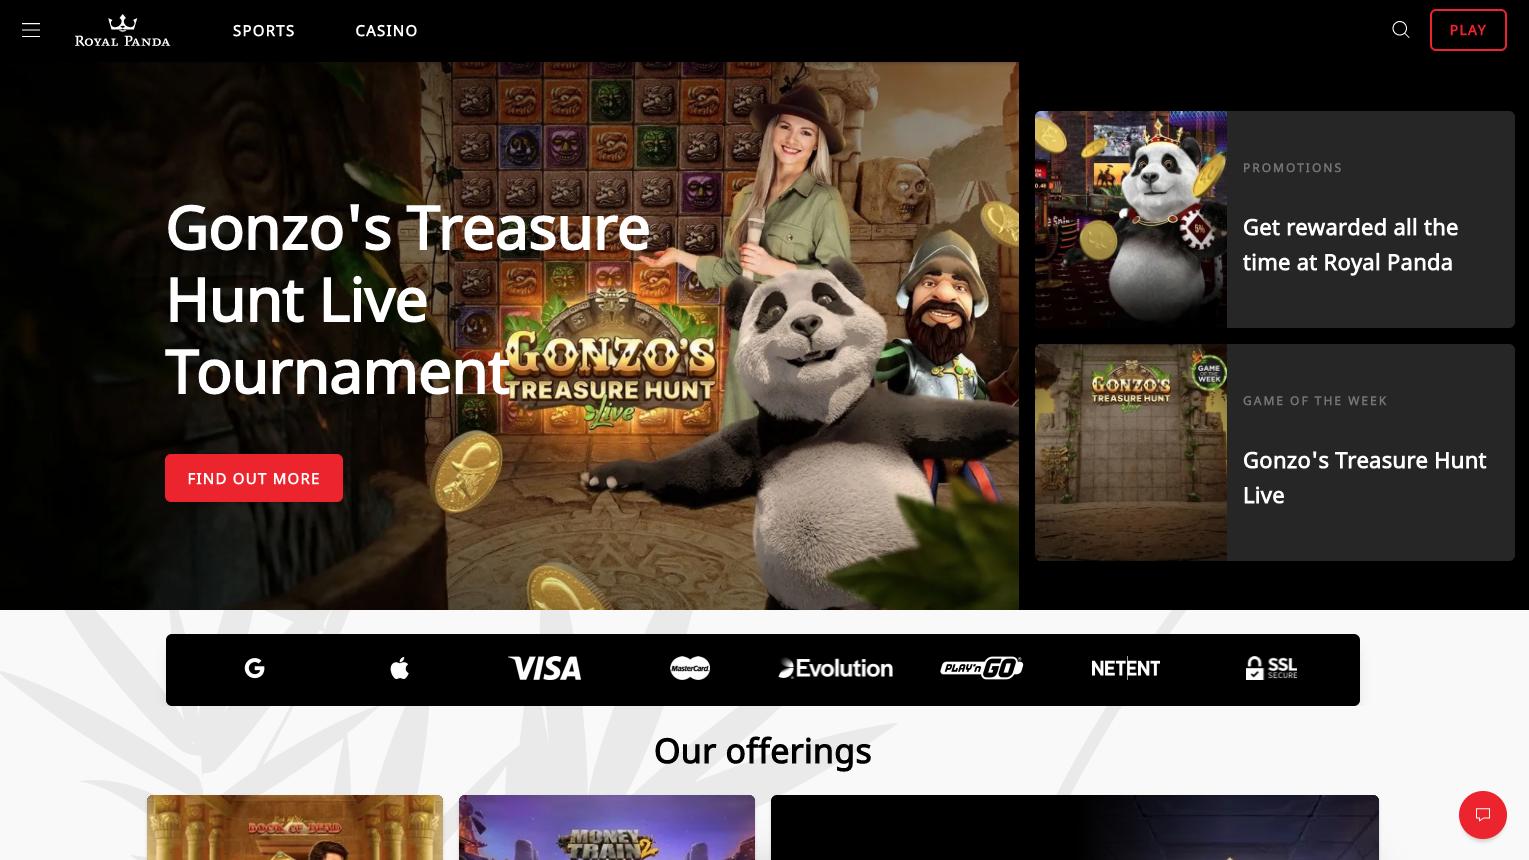 homepage royal panda